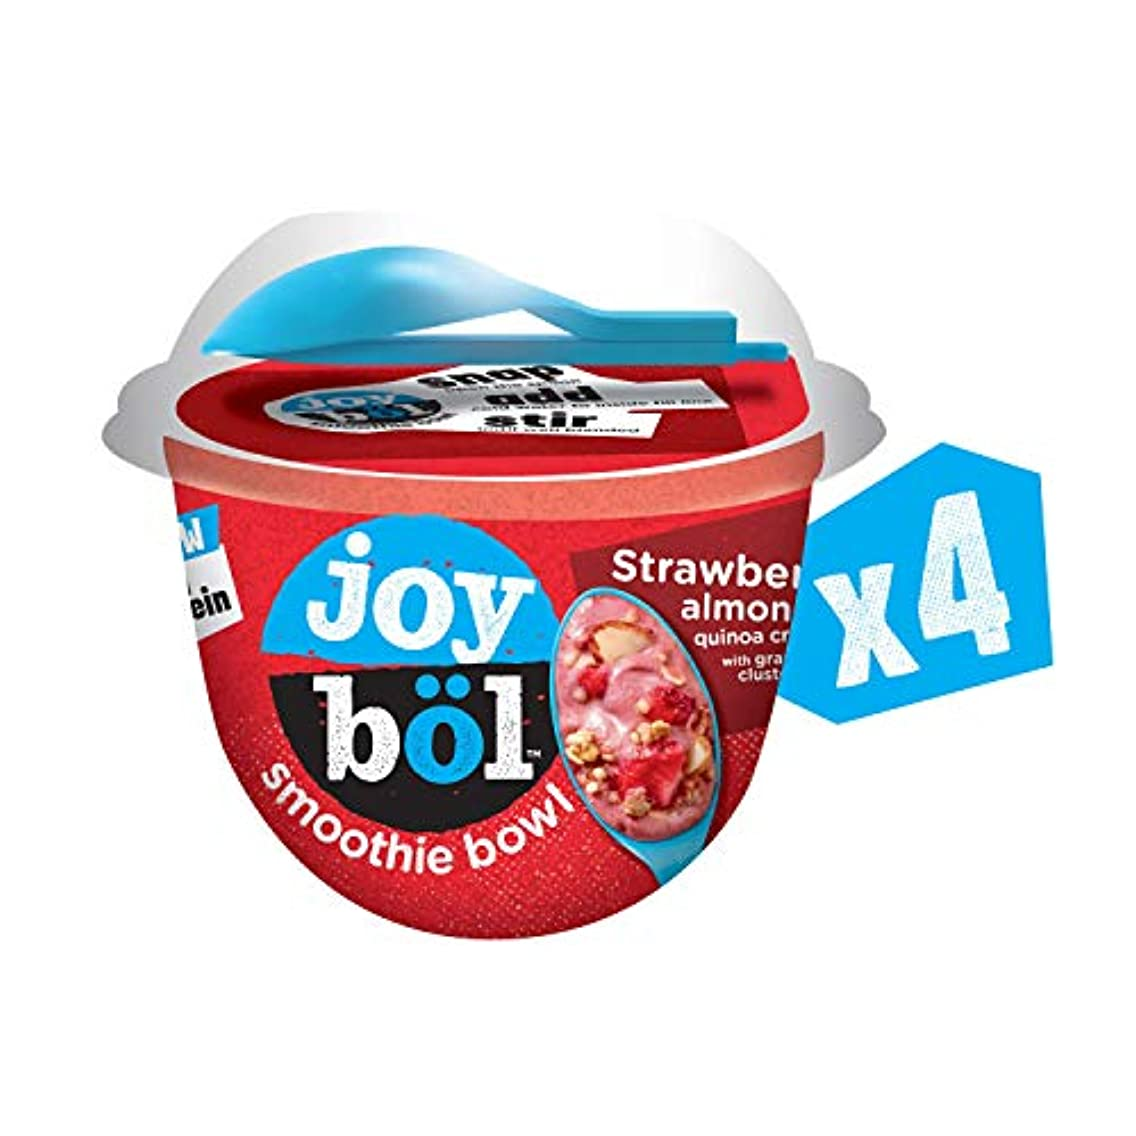 joyb?l Smoothie Bowls, Strawberry Almond Quinoa Crunch, Easy Breakfast, Non-GMO, 4 Count